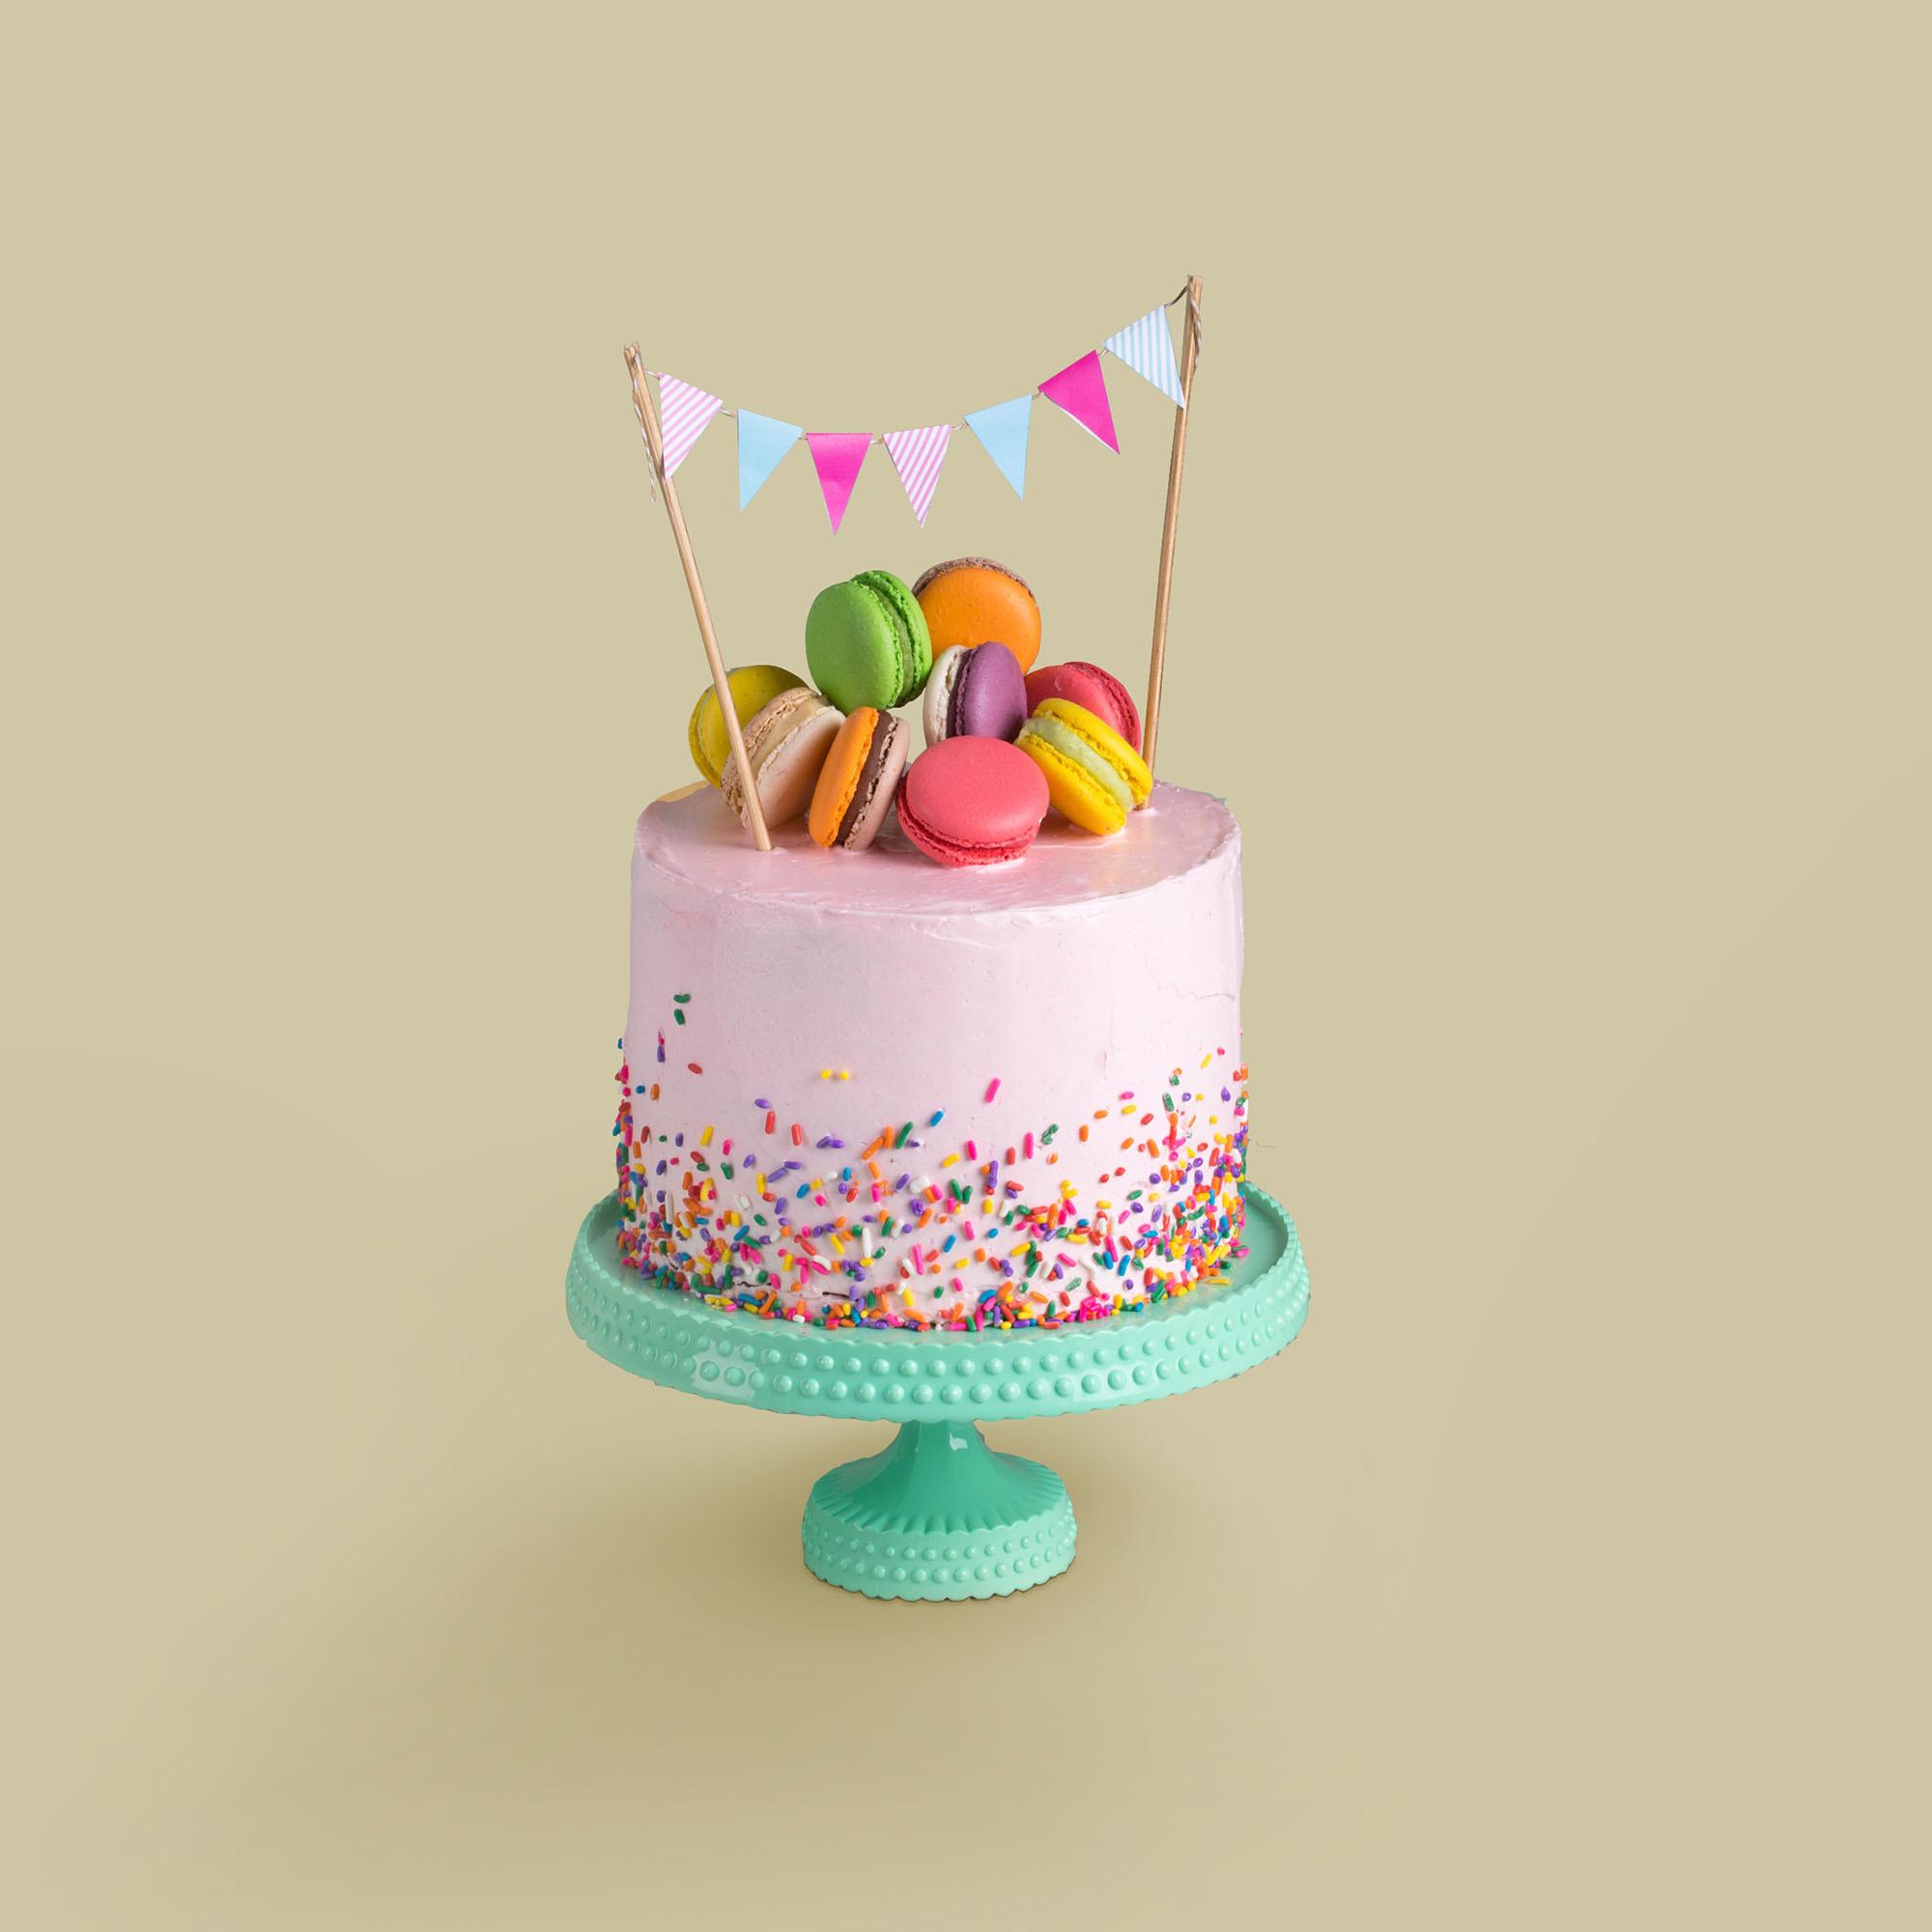 Cake Smash with Cake